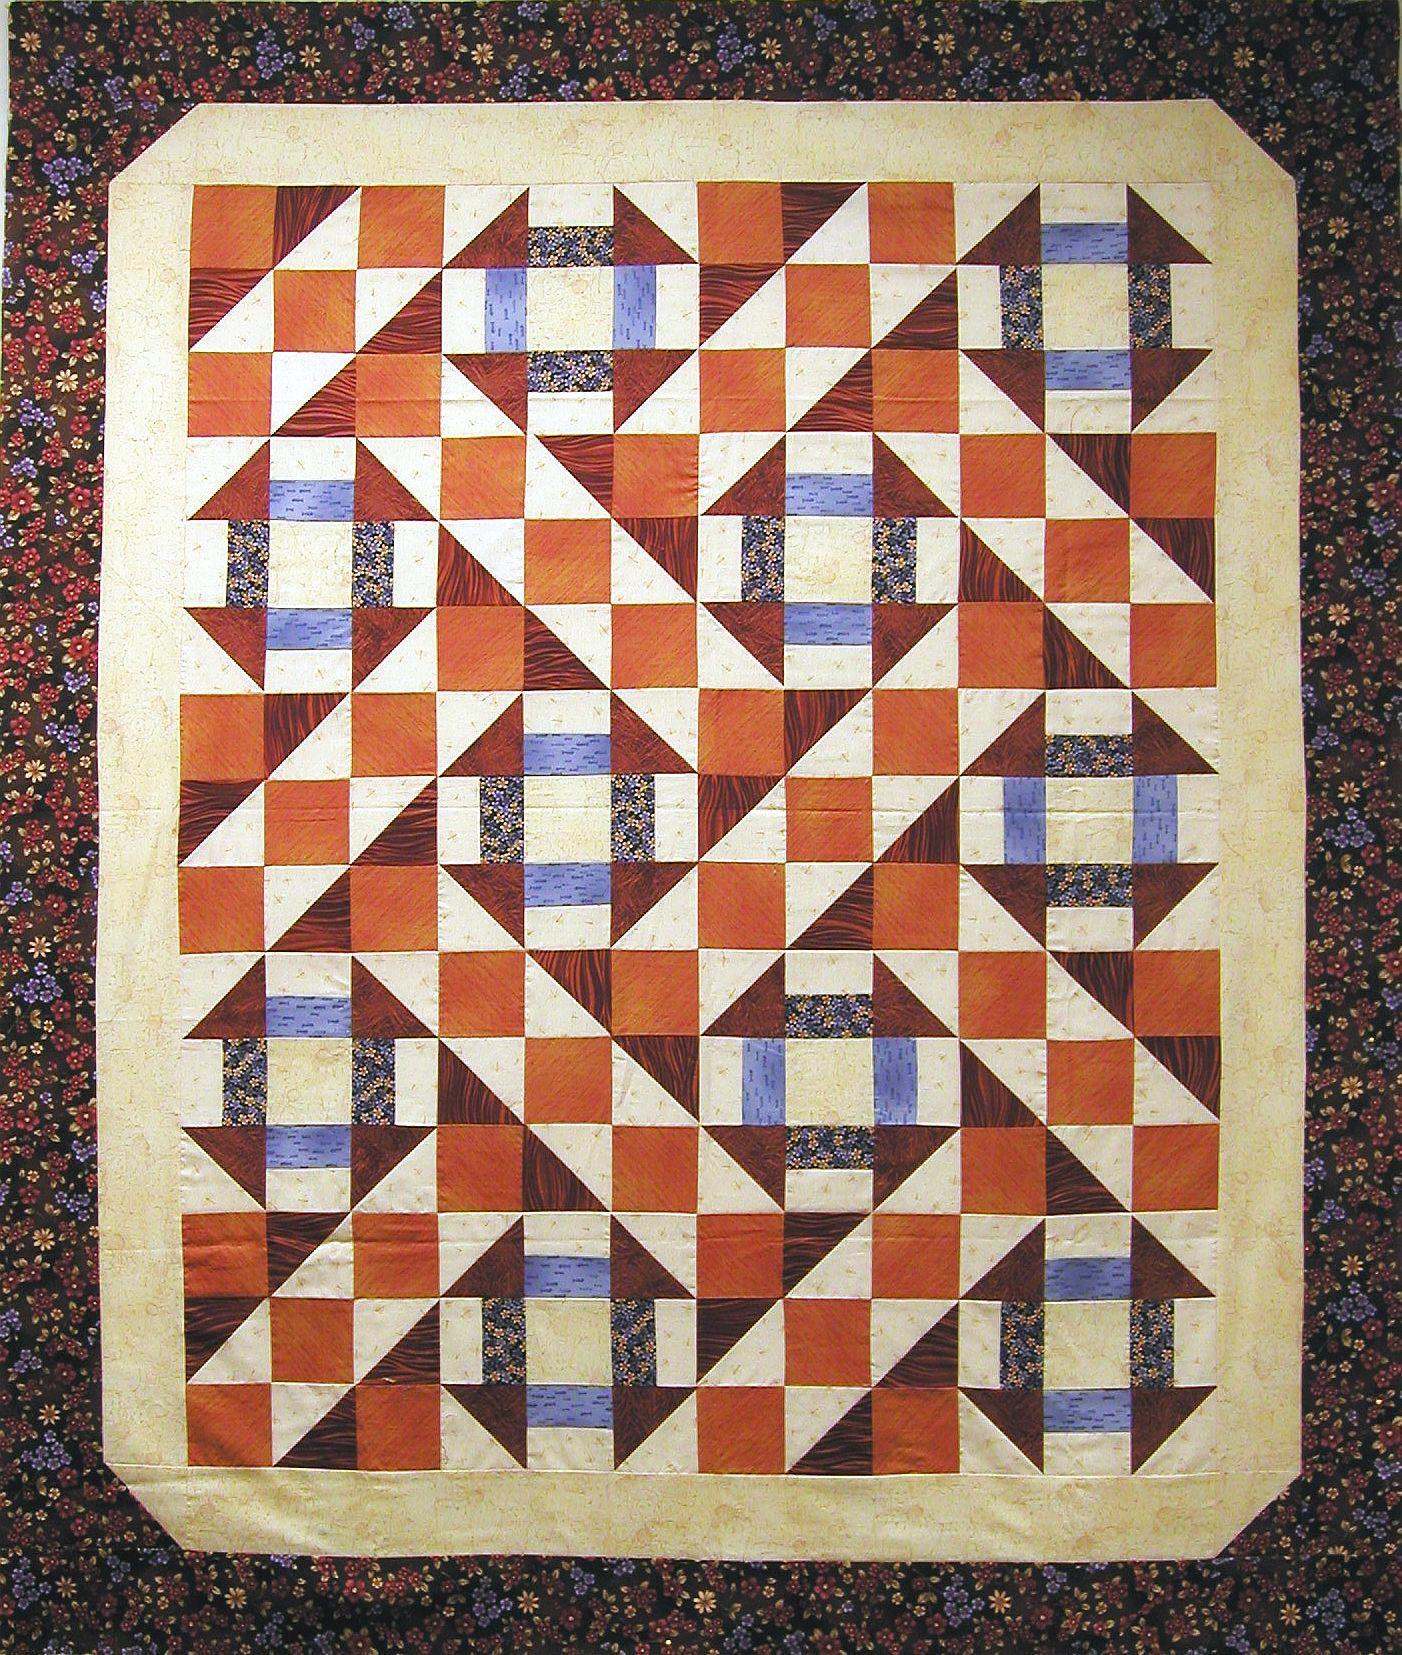 catercorner-quilt-top.jpg (1402Ã?1655) | Quilting | Pinterest | Boy ... : quilt design - Adamdwight.com